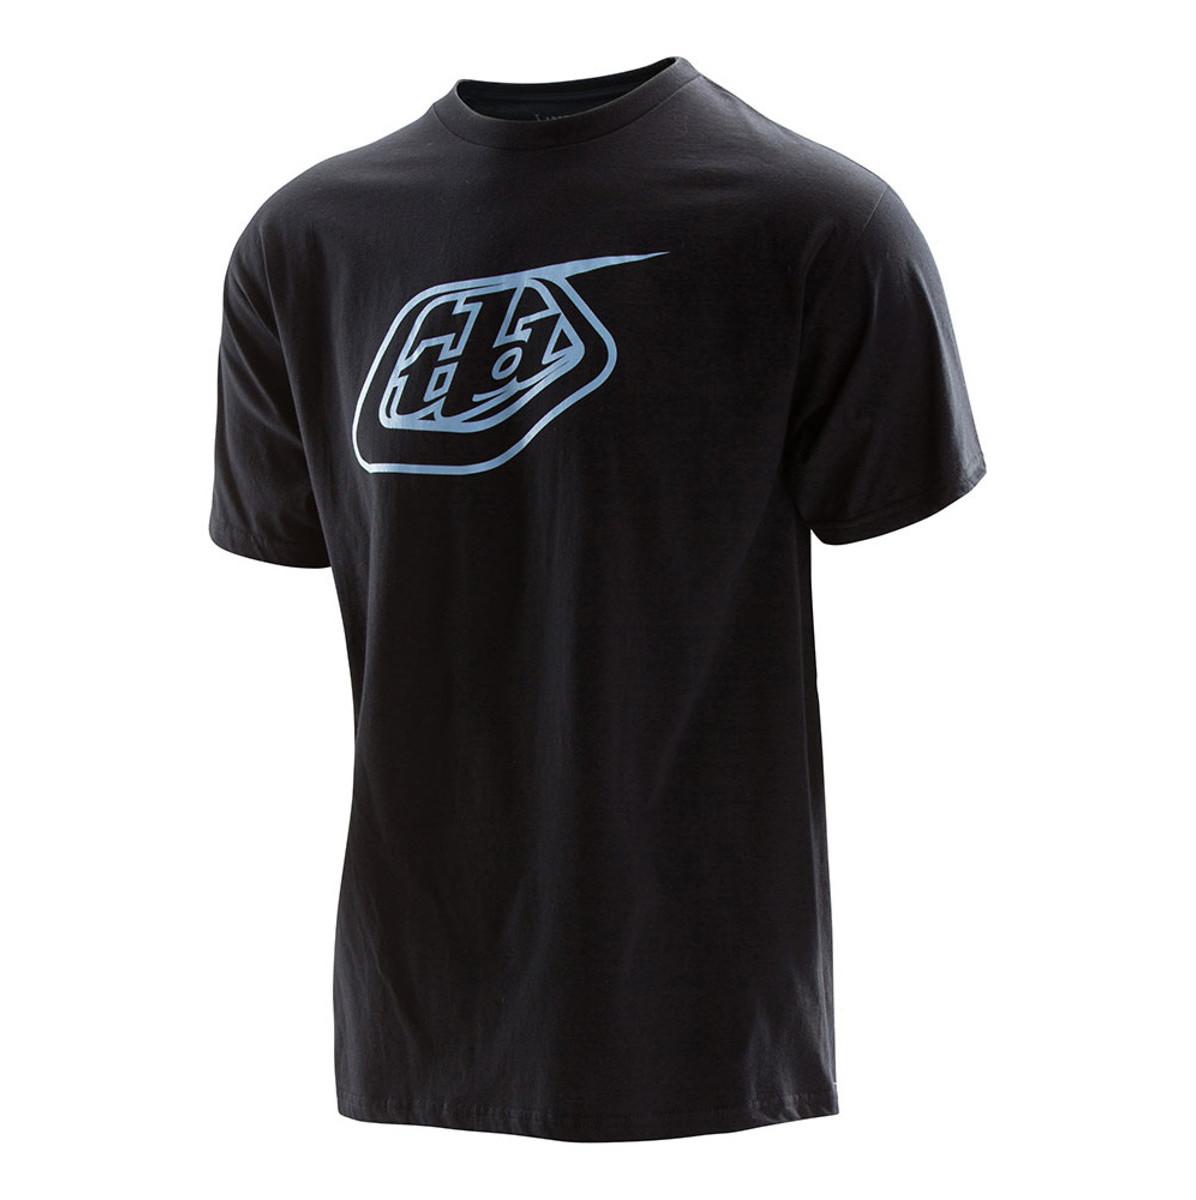 TLD Logo Tee - black:blue